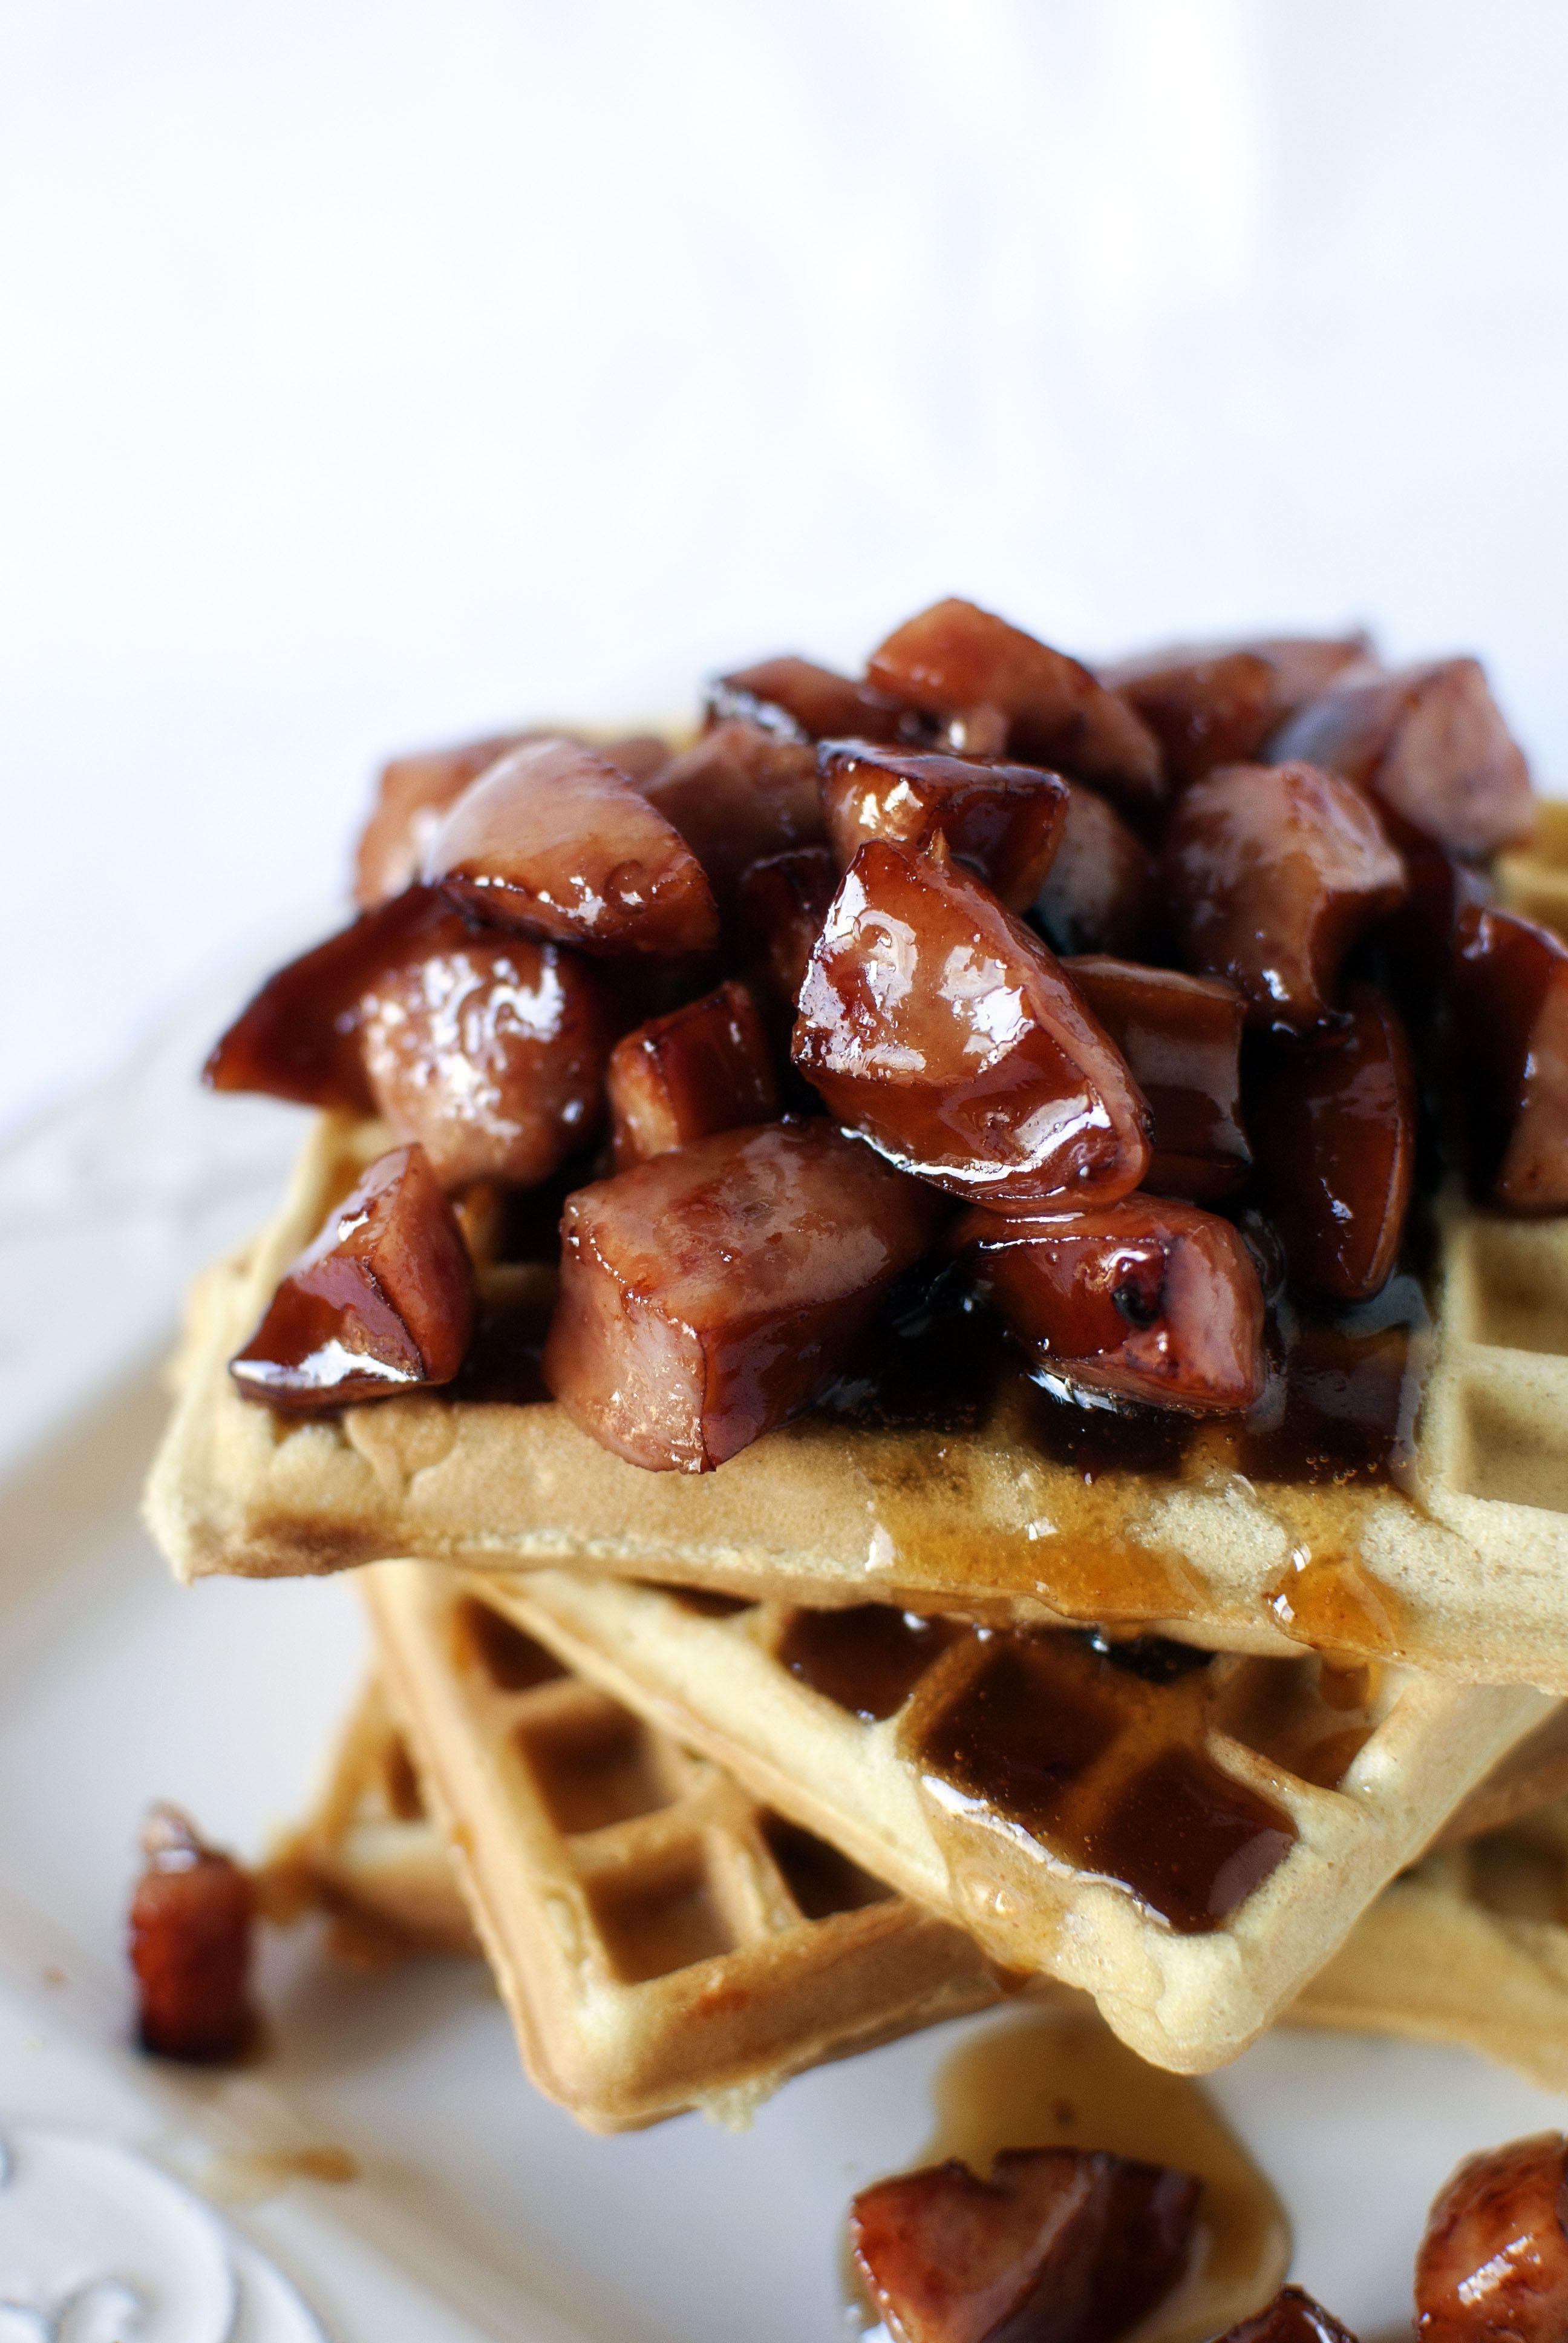 Waffle House Cheddar Waffles With Kielbasa In Maple Syrup Waffles Recipes Waffle House